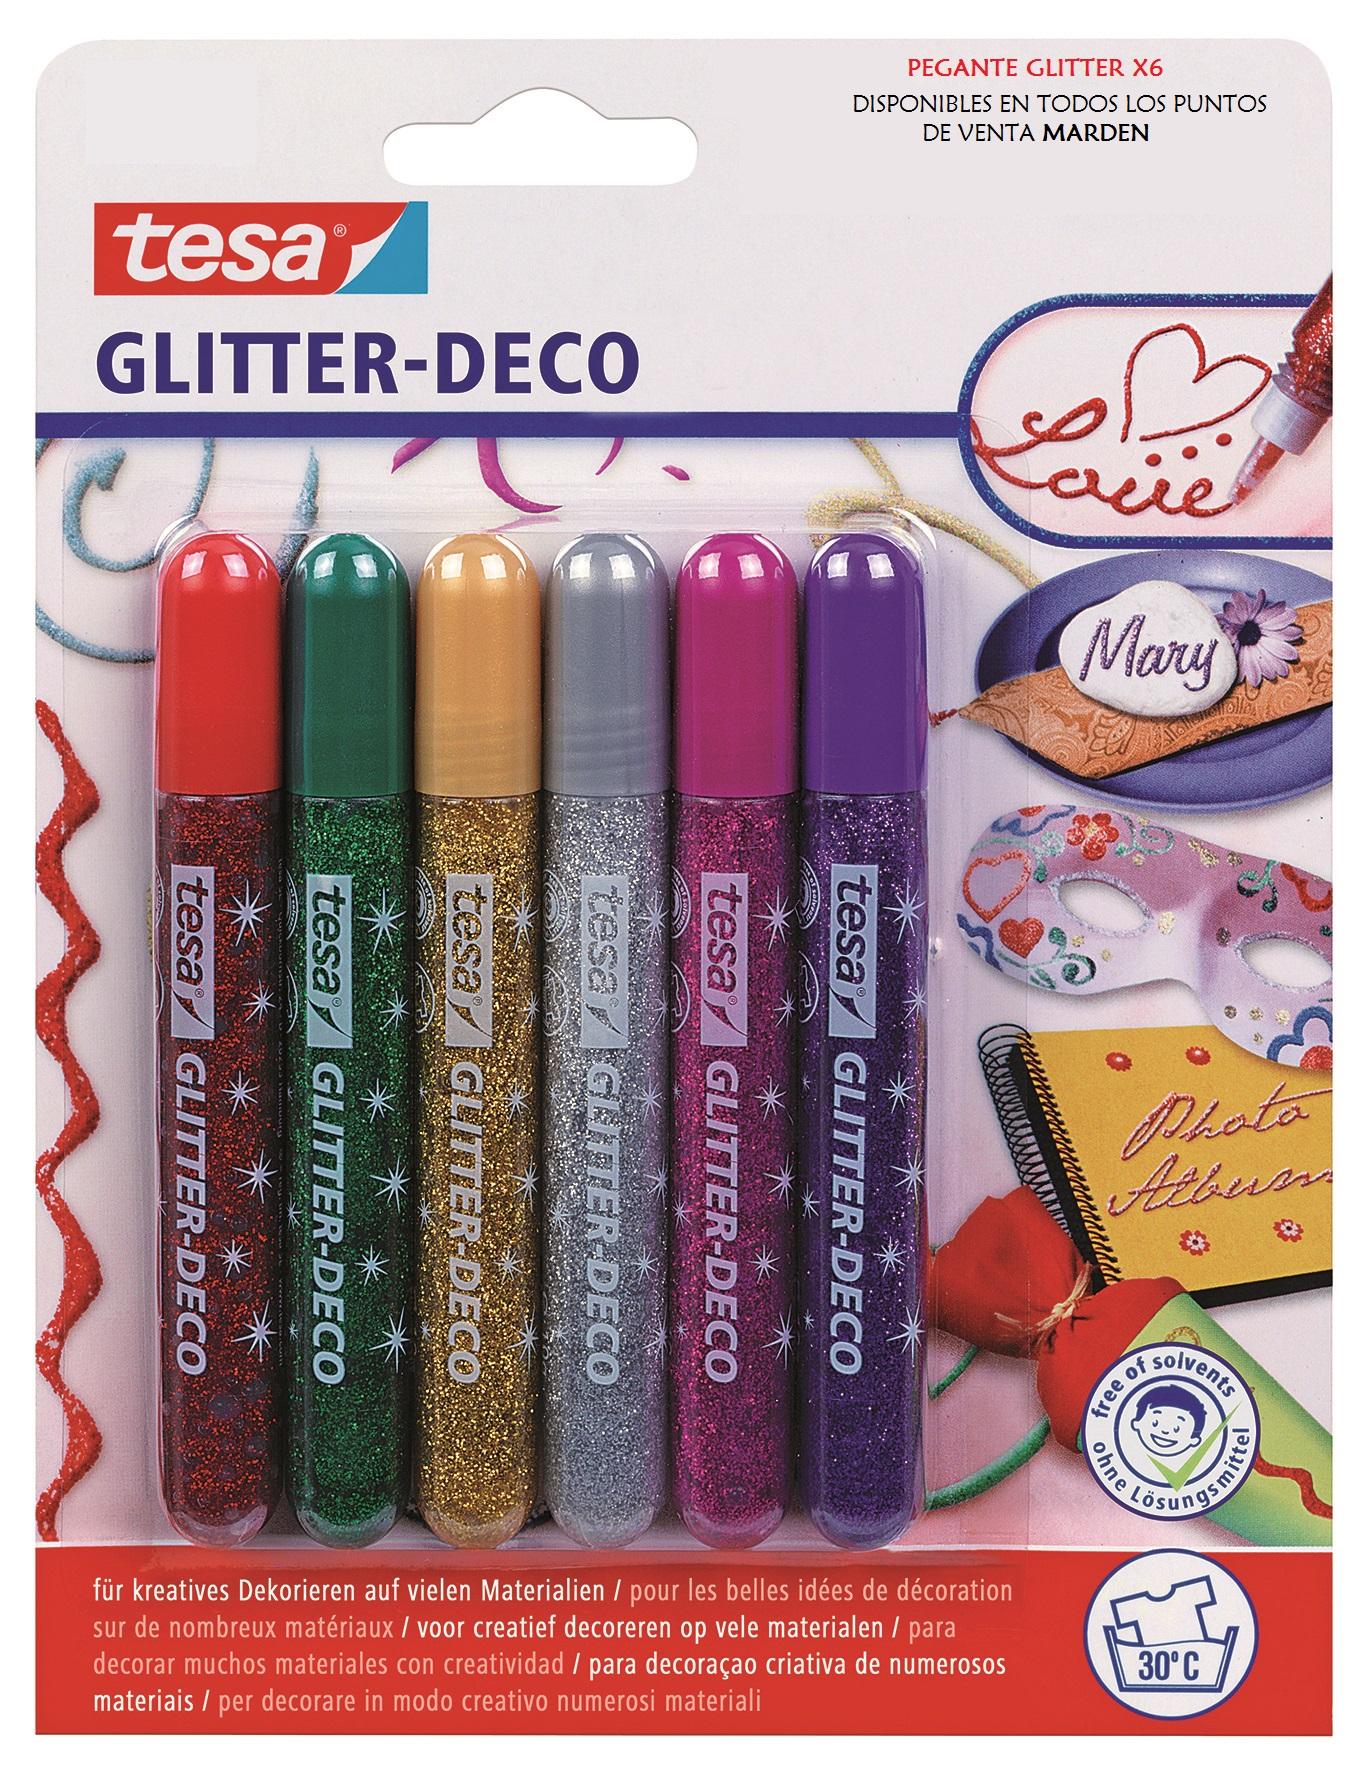 Glitter Deco TESA